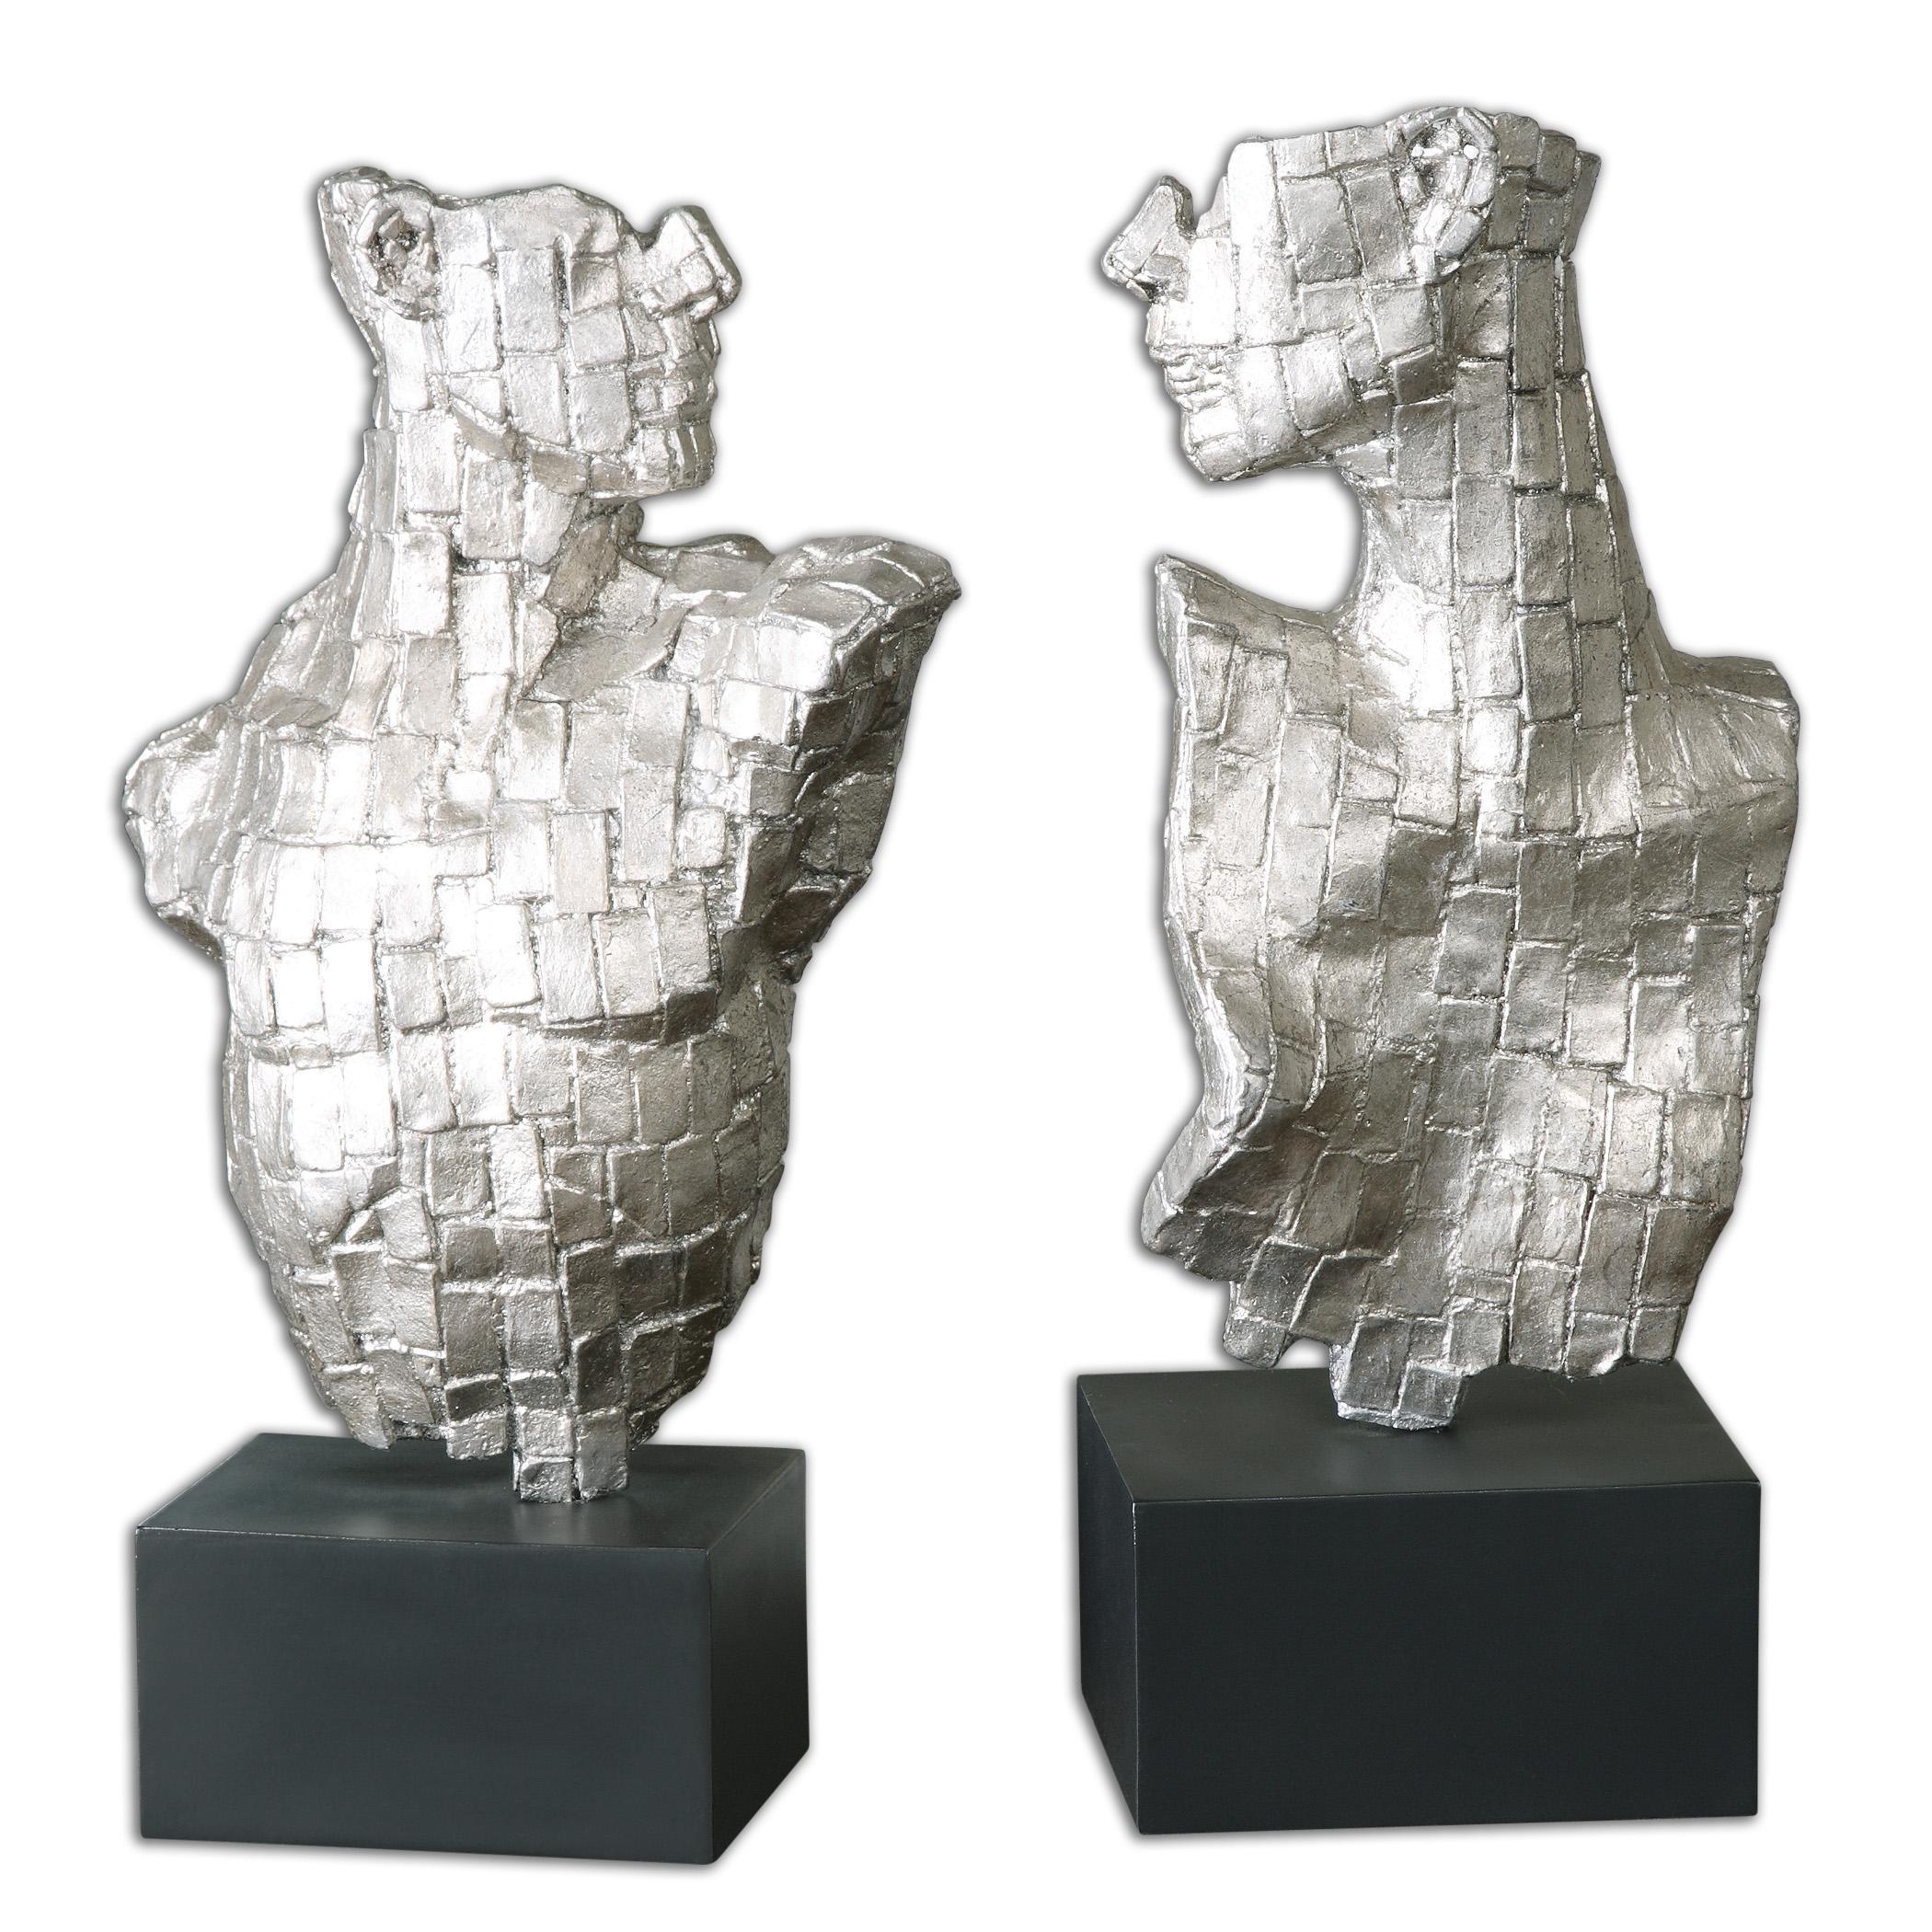 Uttermost Accessories Eros Silver Sculptures Set of 2 - Item Number: 19887